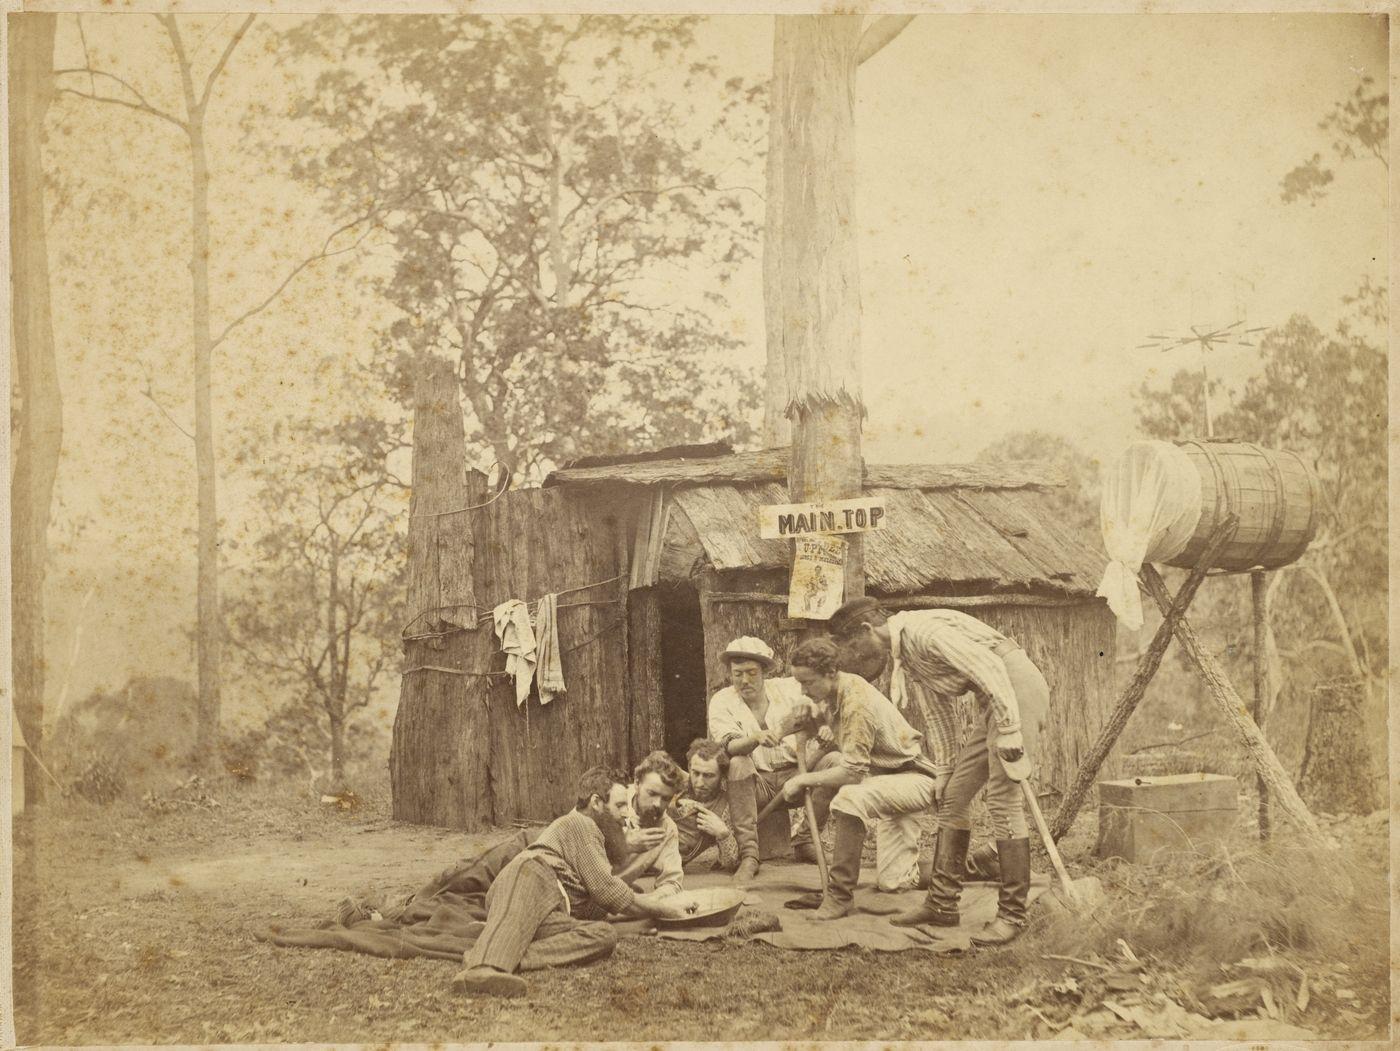 Digging for gold. Australia. ca. 1870